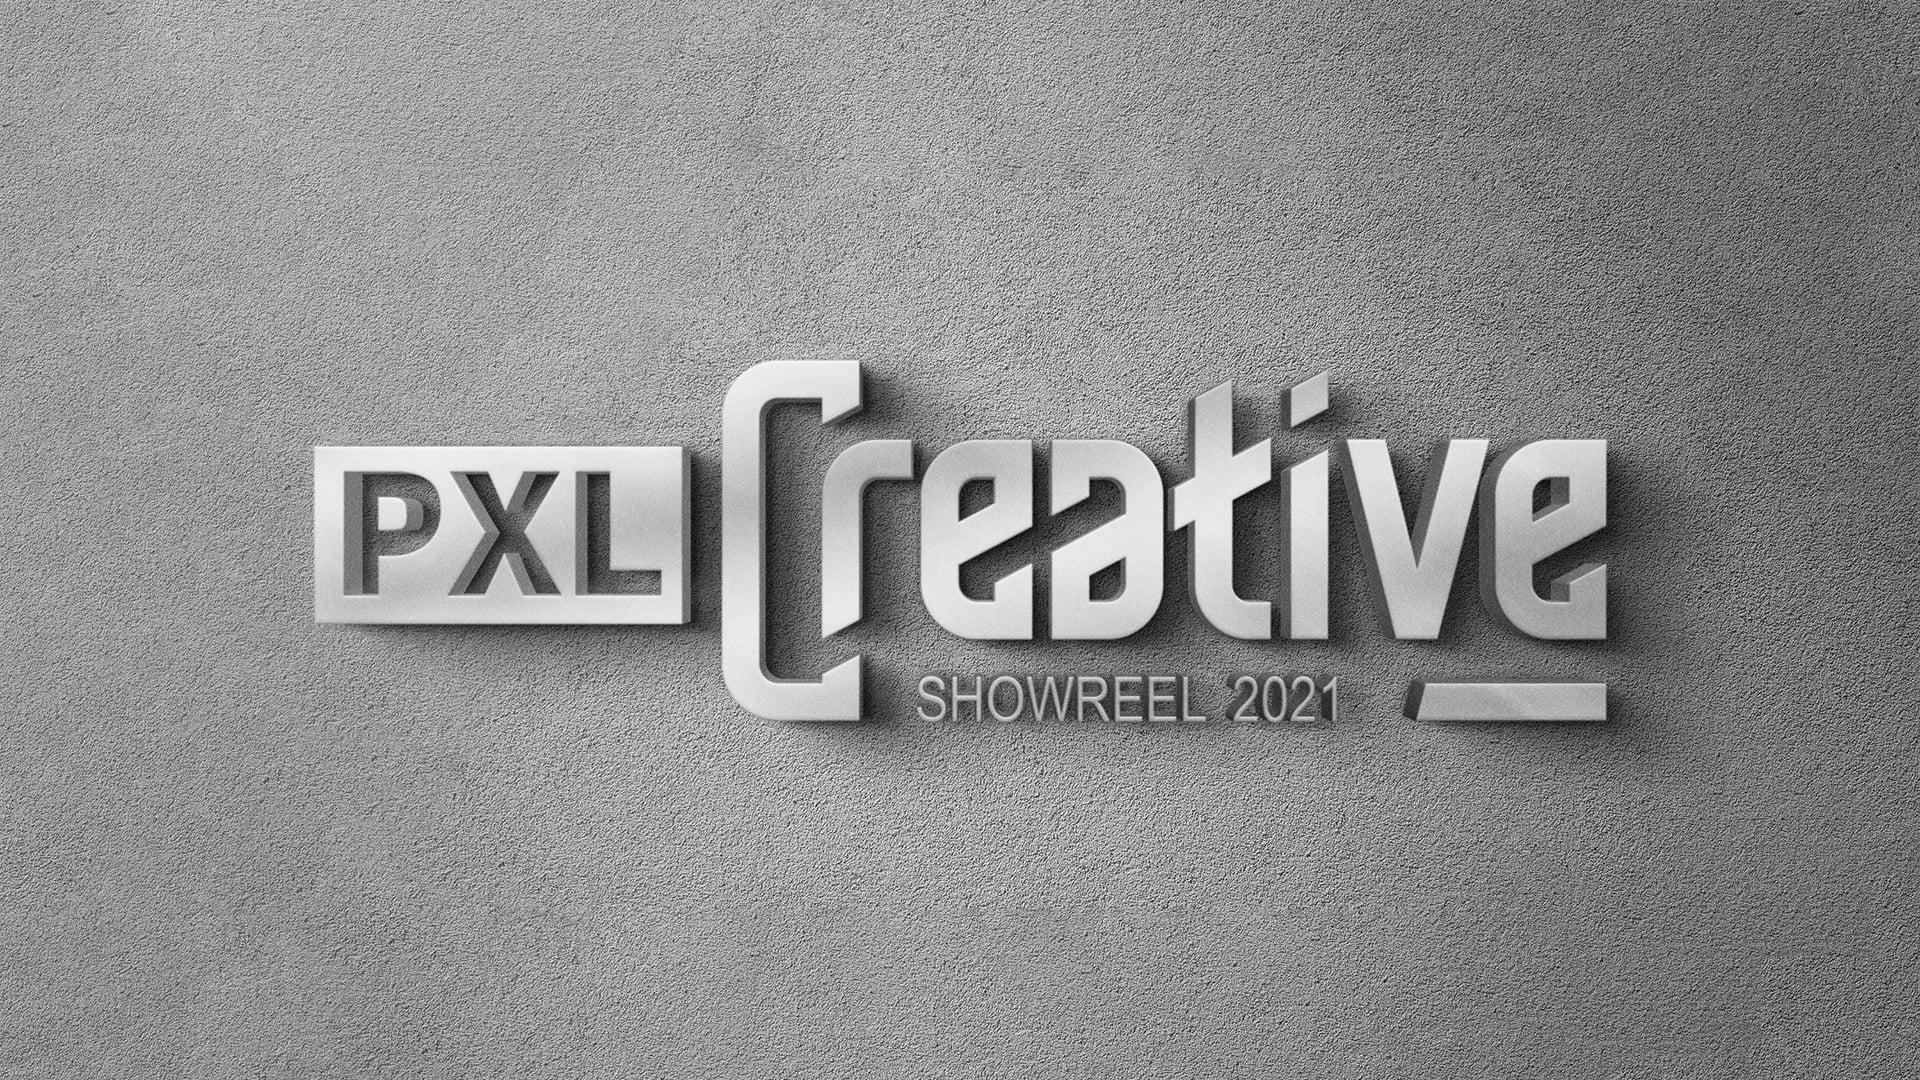 PXL Creative Showreel 2021.mp4